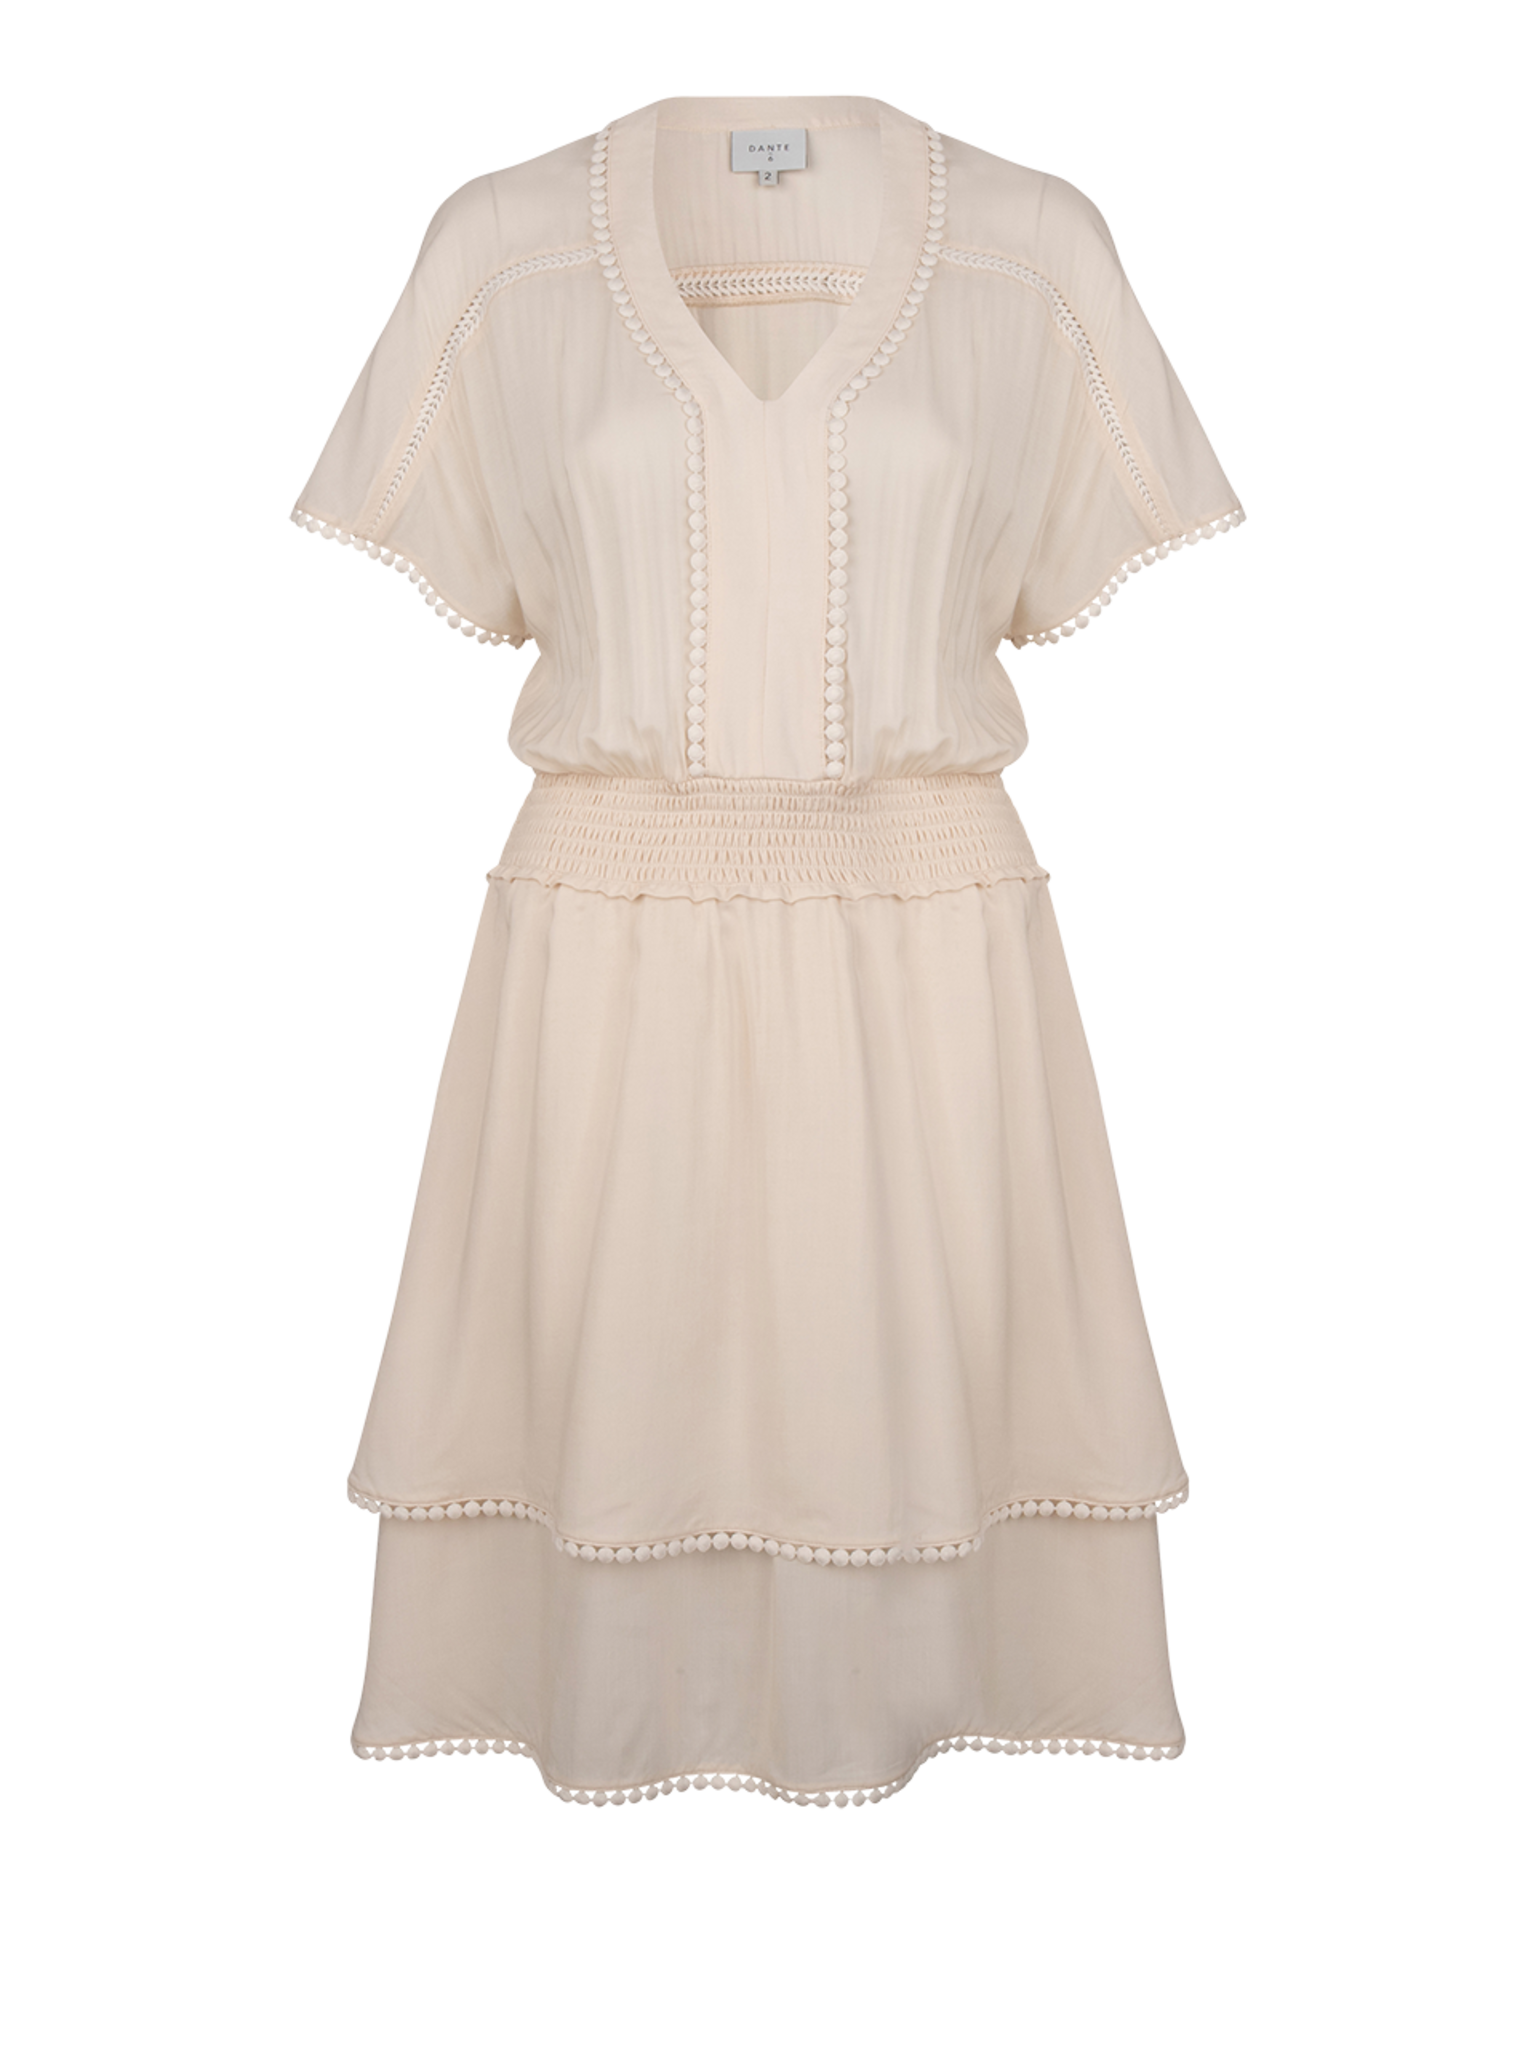 Dante 6 Dress 211105 LEISURE-1